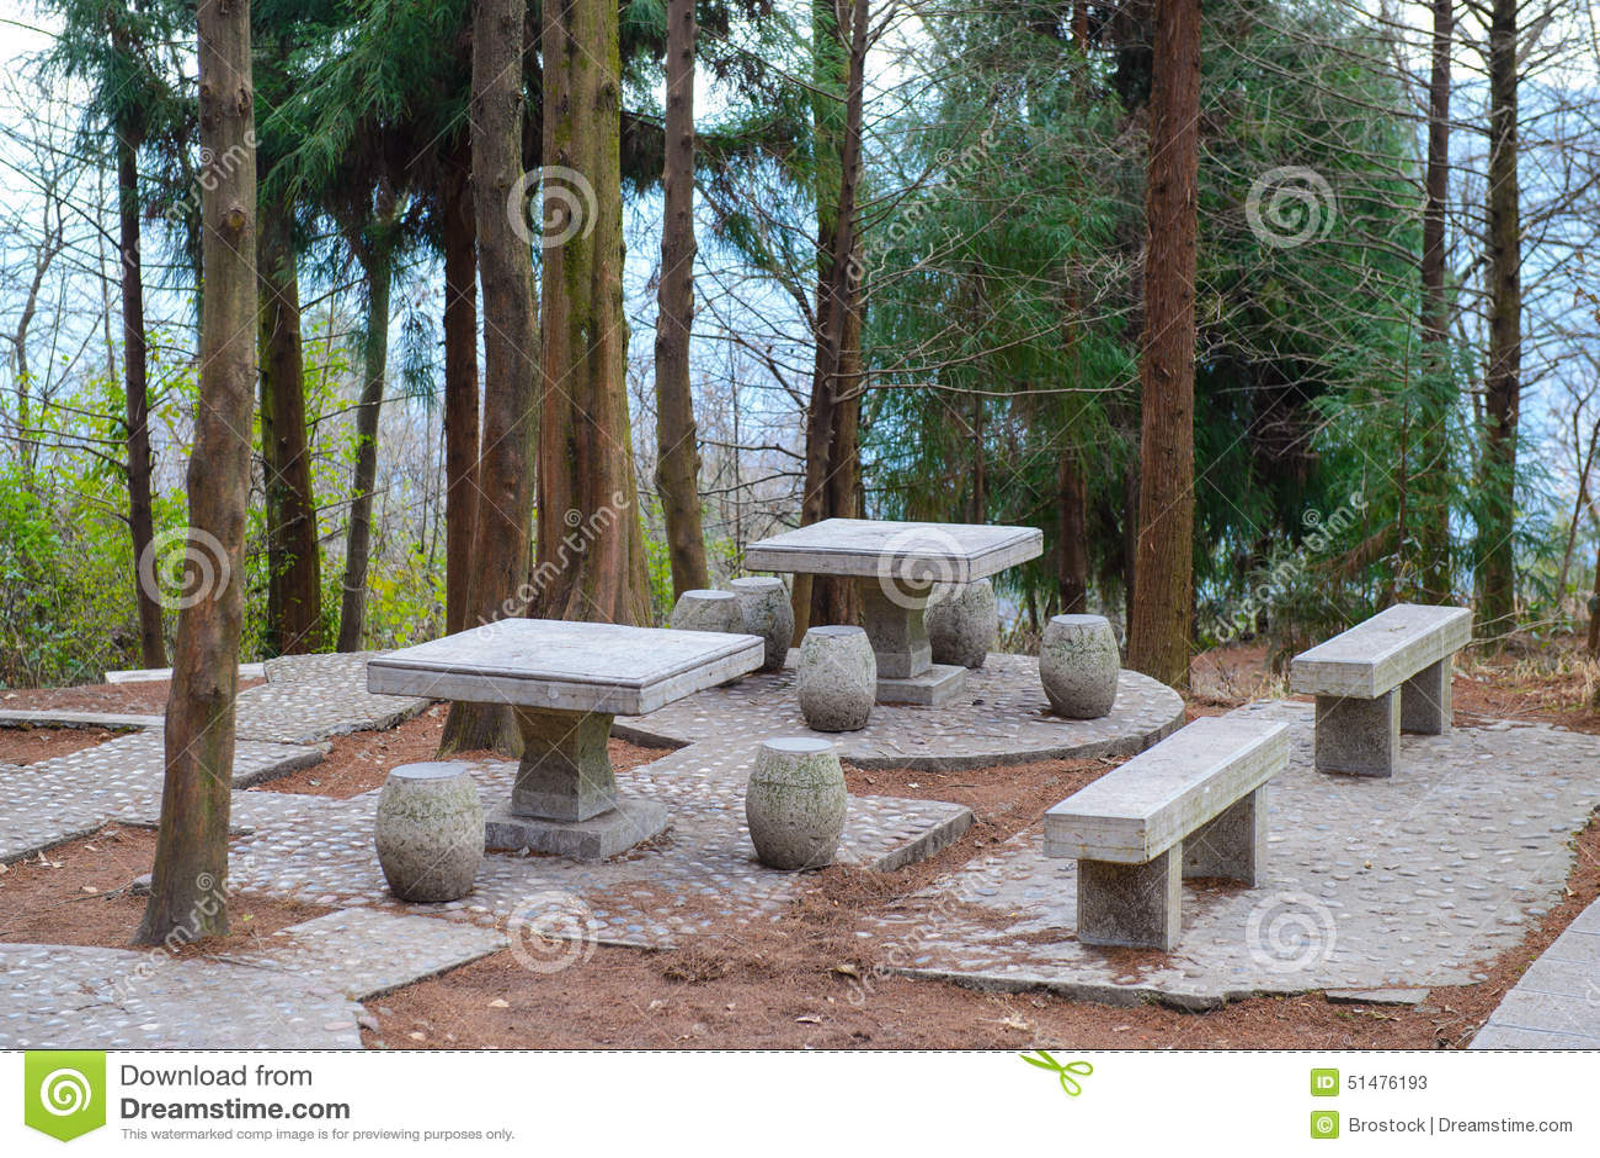 Backyard Benches Patio Picnic Stone Tables ...